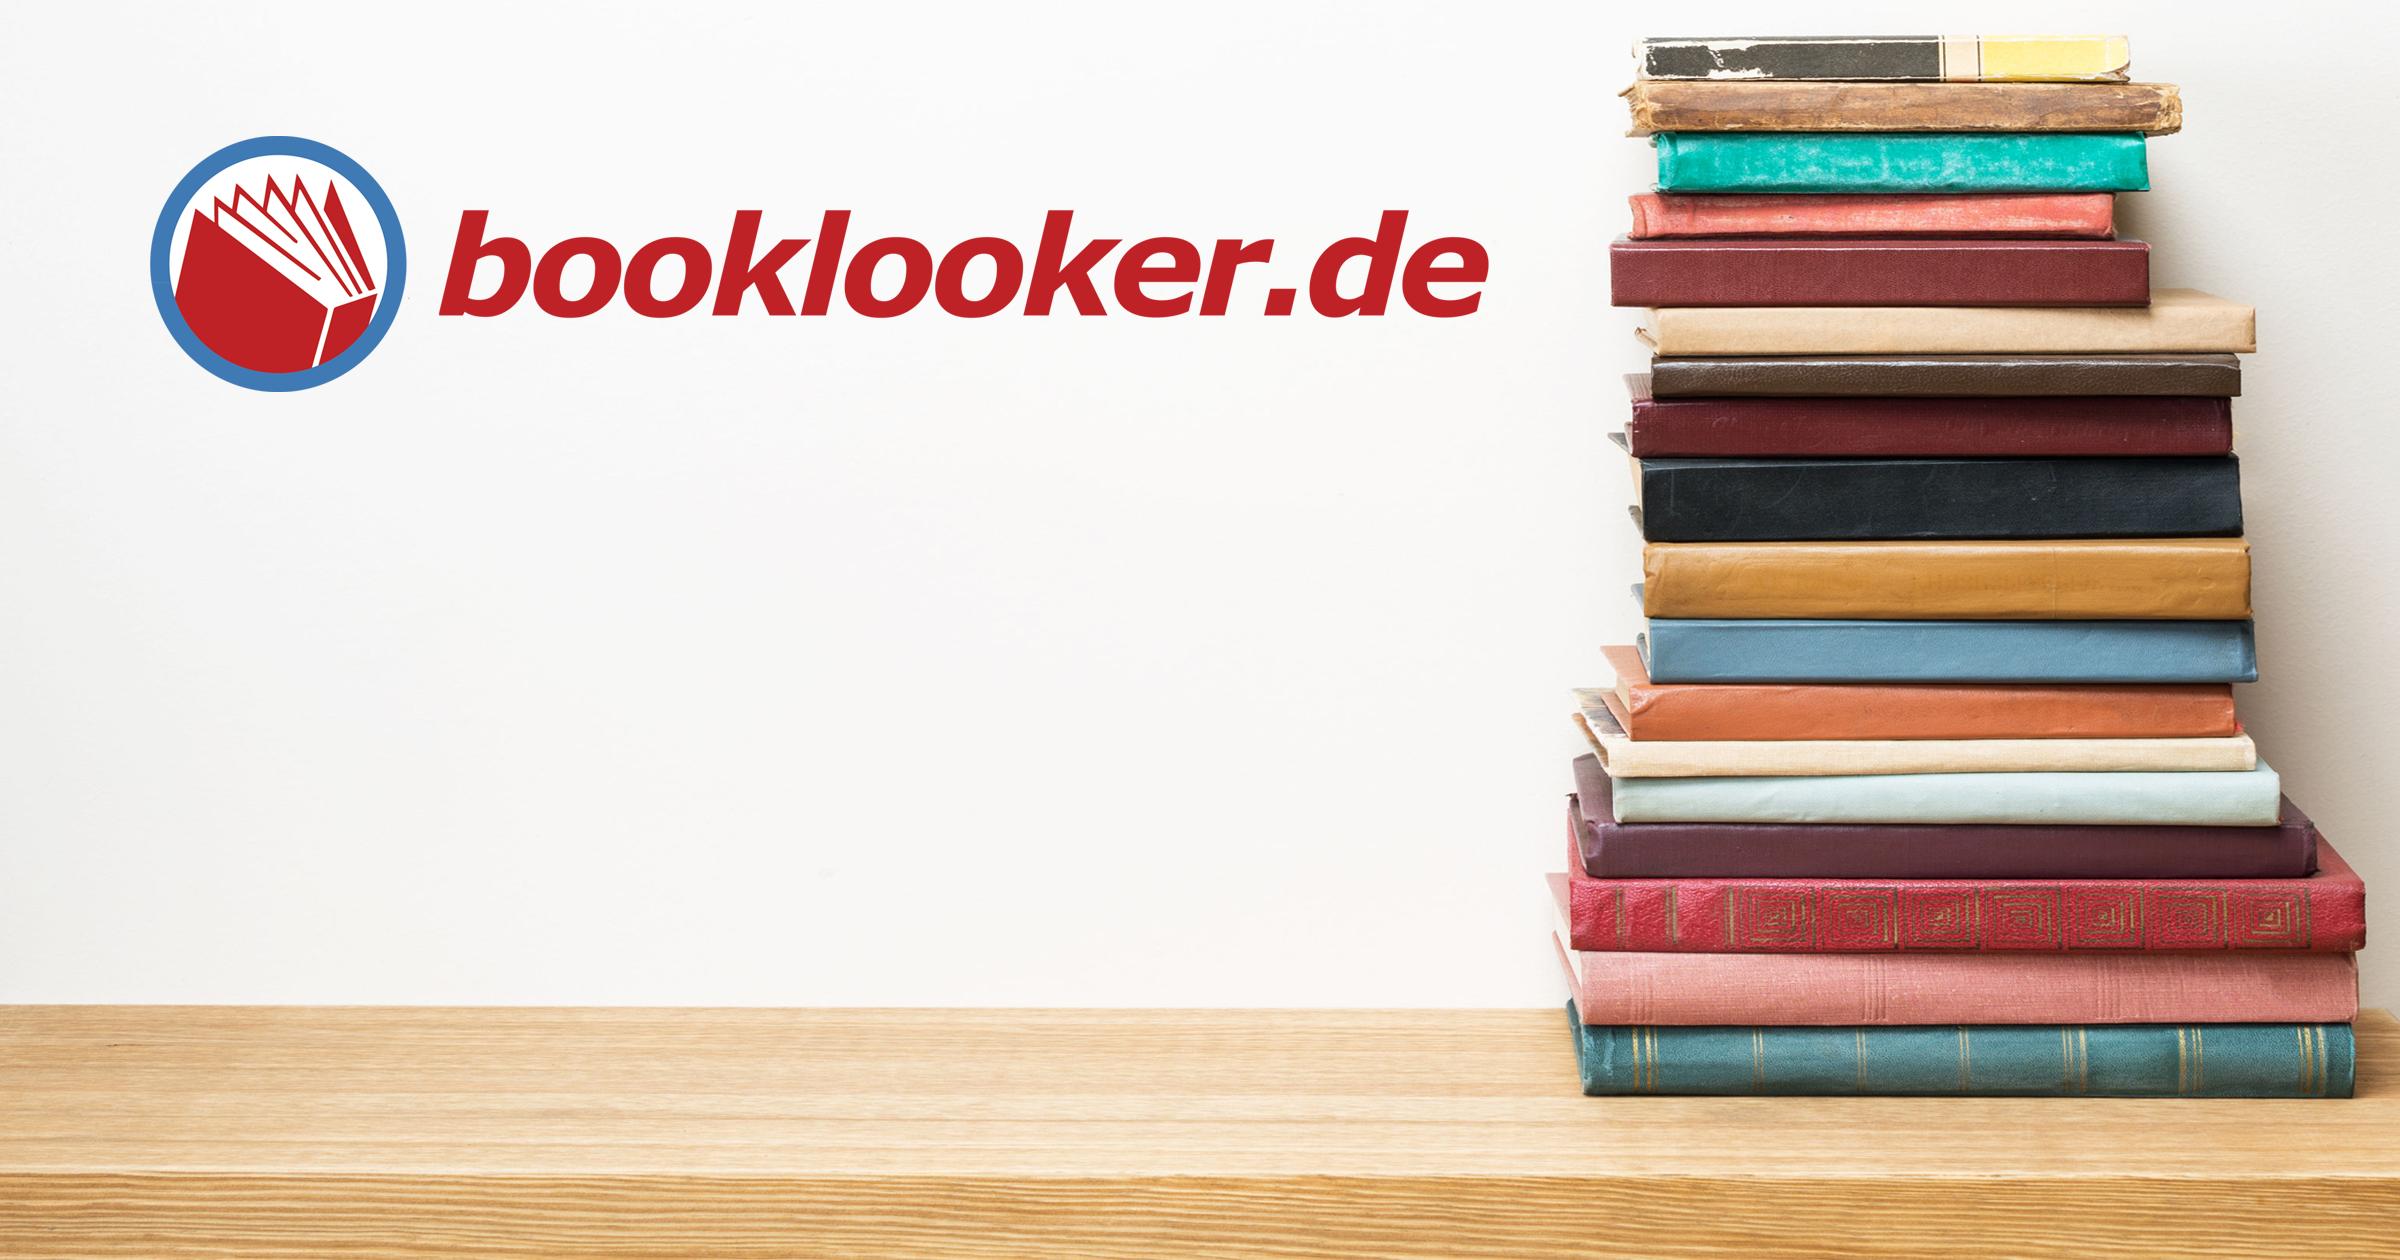 www.booklooker.de